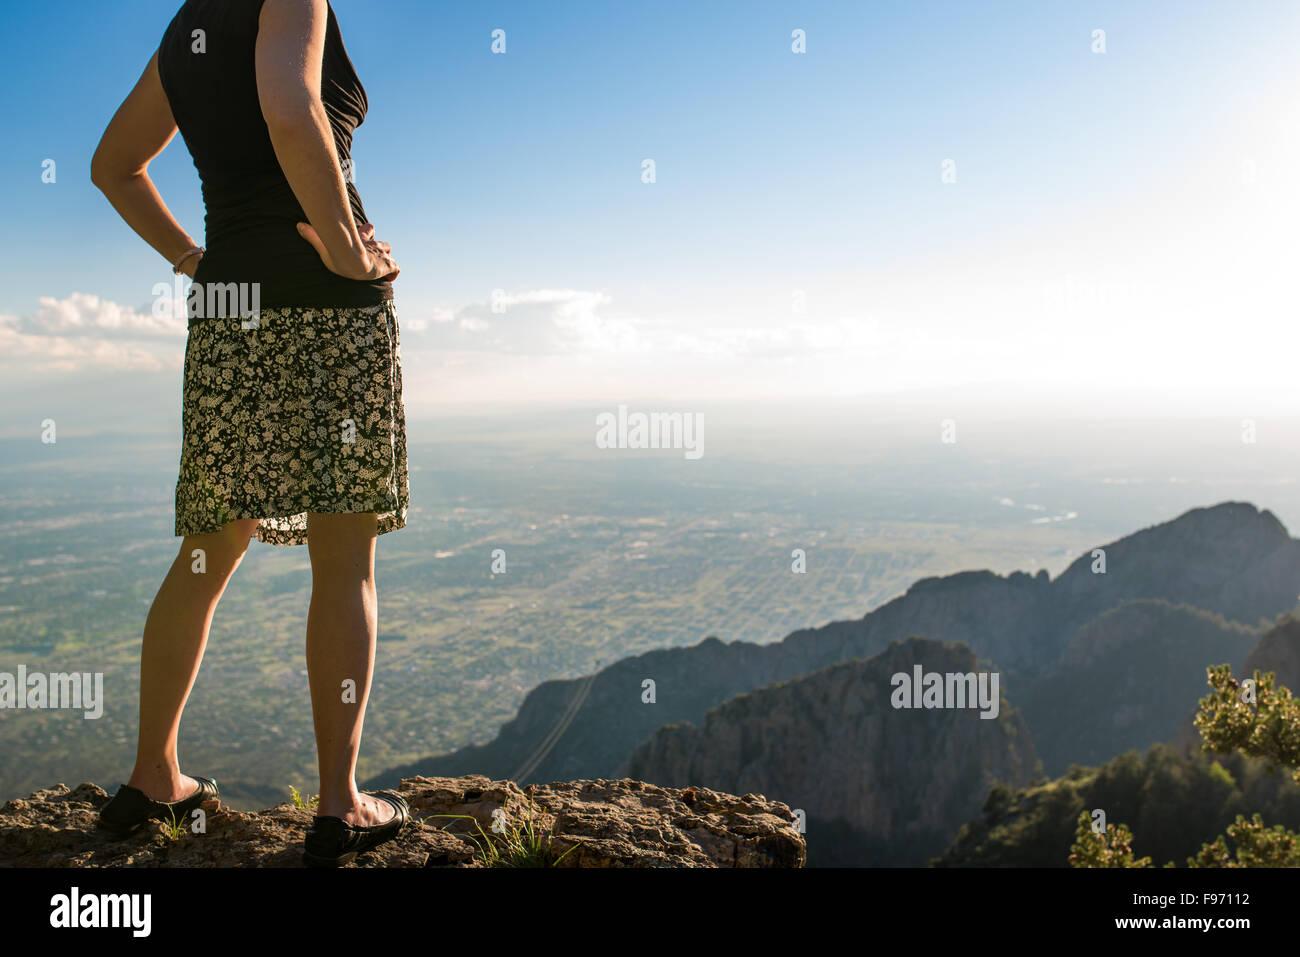 Wandern und Lookout am Sandia Peak, Albuquerque, New Mexico. Stockbild